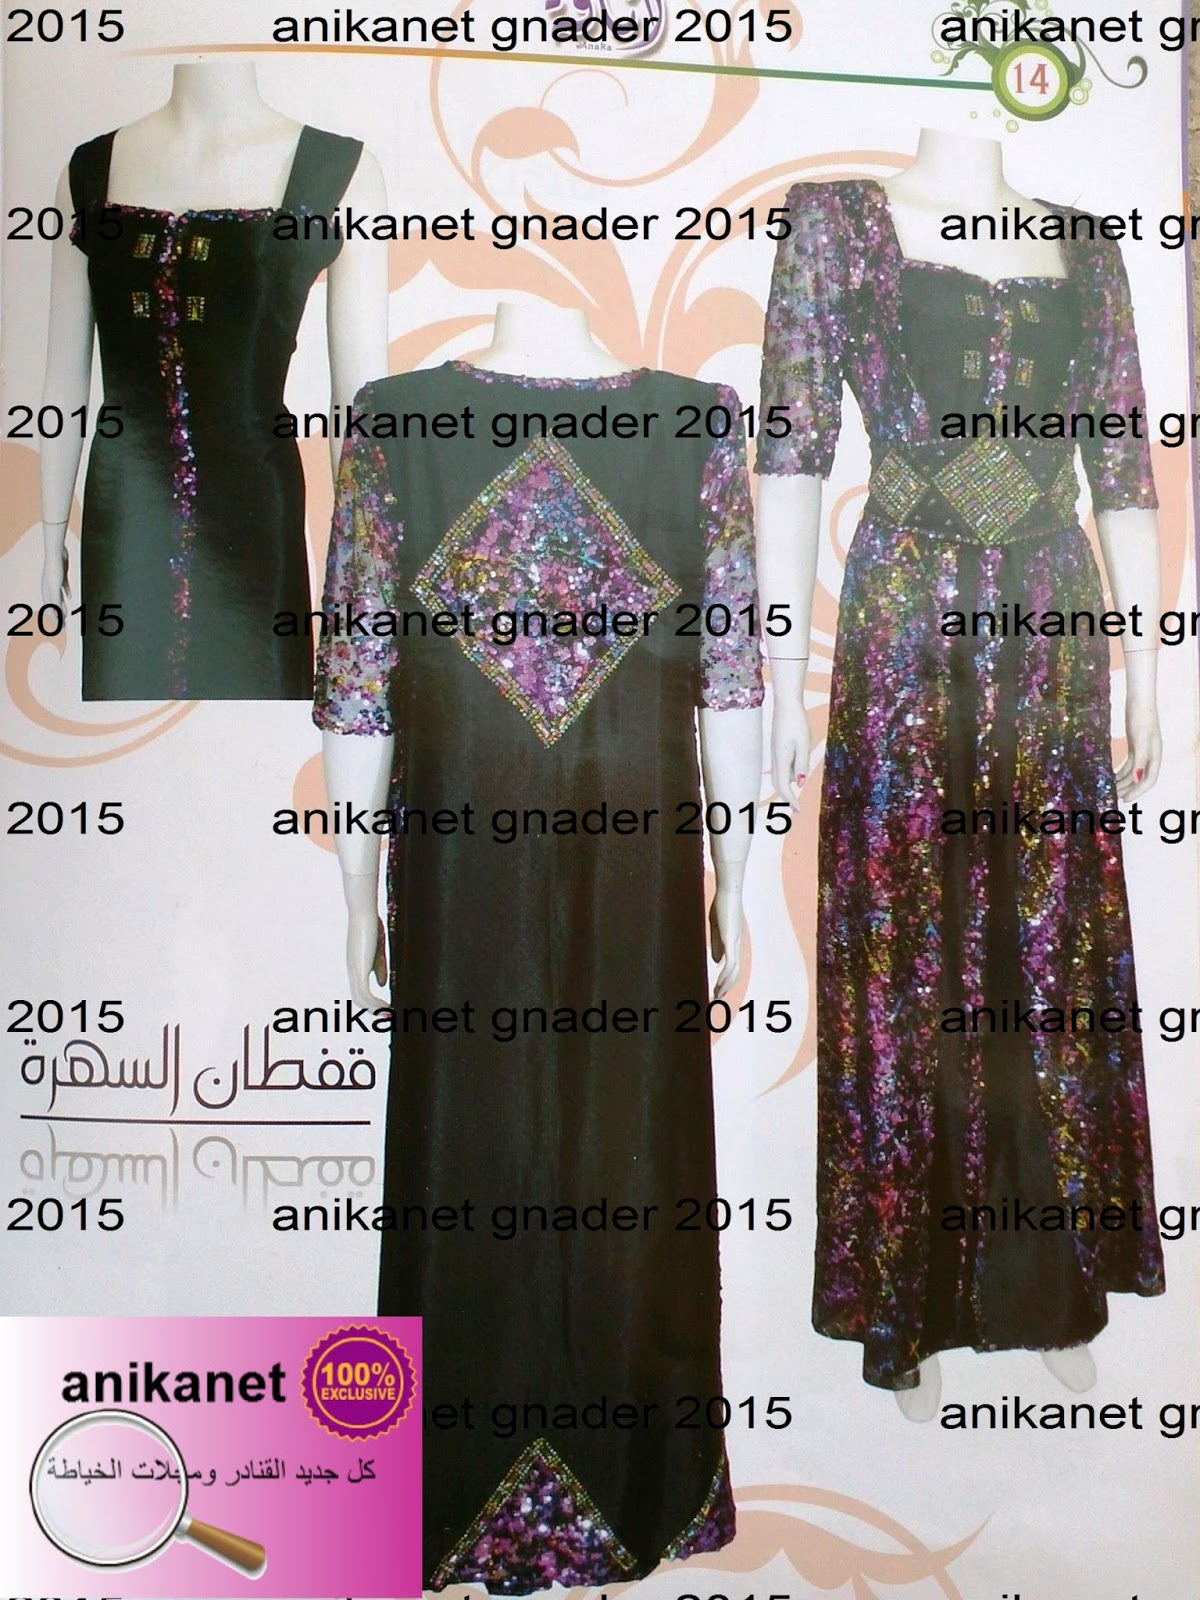 gnader arassi 2015 magazine anaka collection 2 ~ anikanet gnader 2015